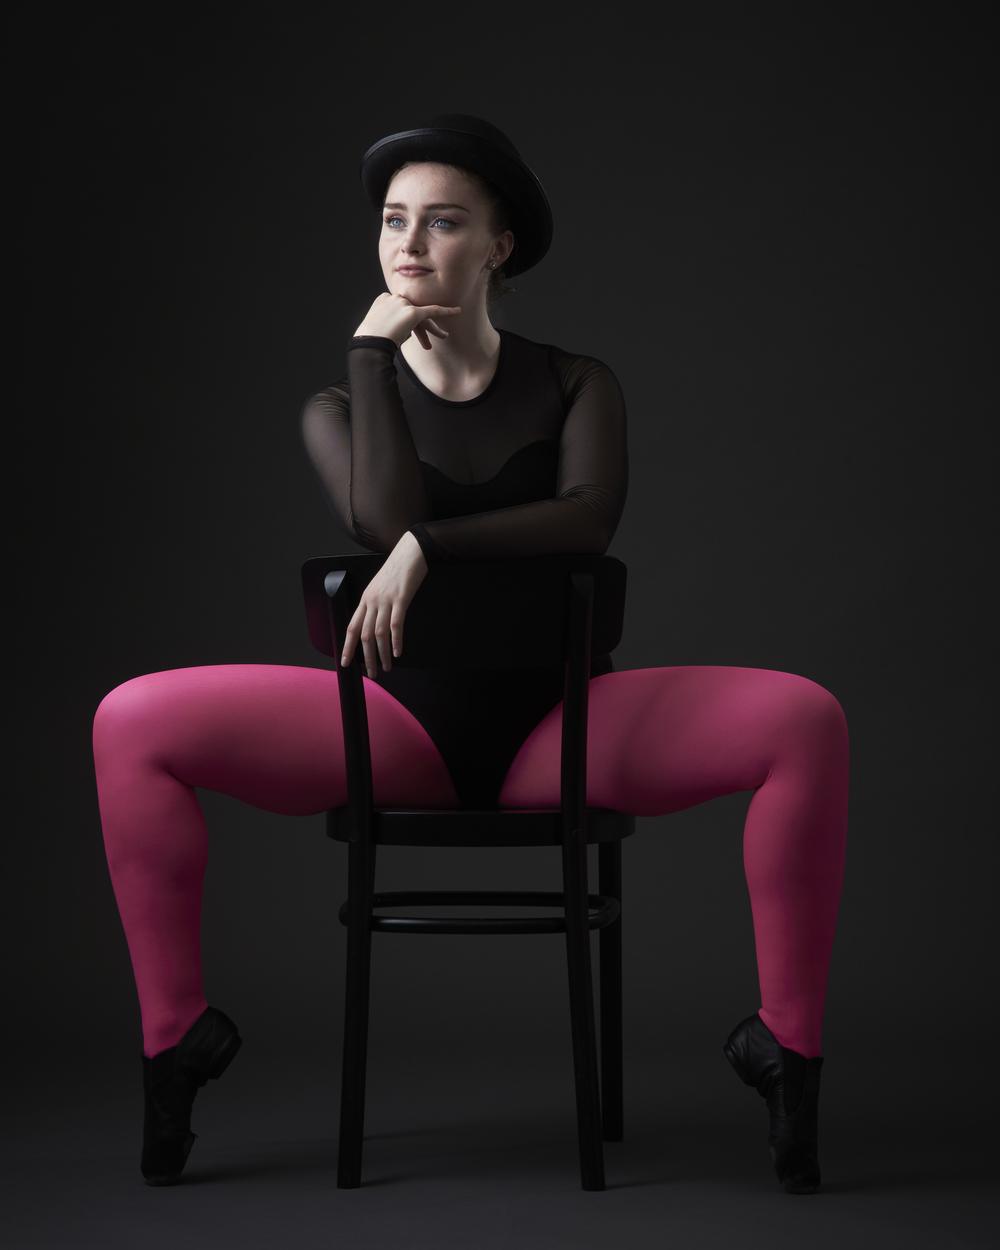 FotoFun Elise Phillipi Ballet_DSC2938_PSD_HR.jpg